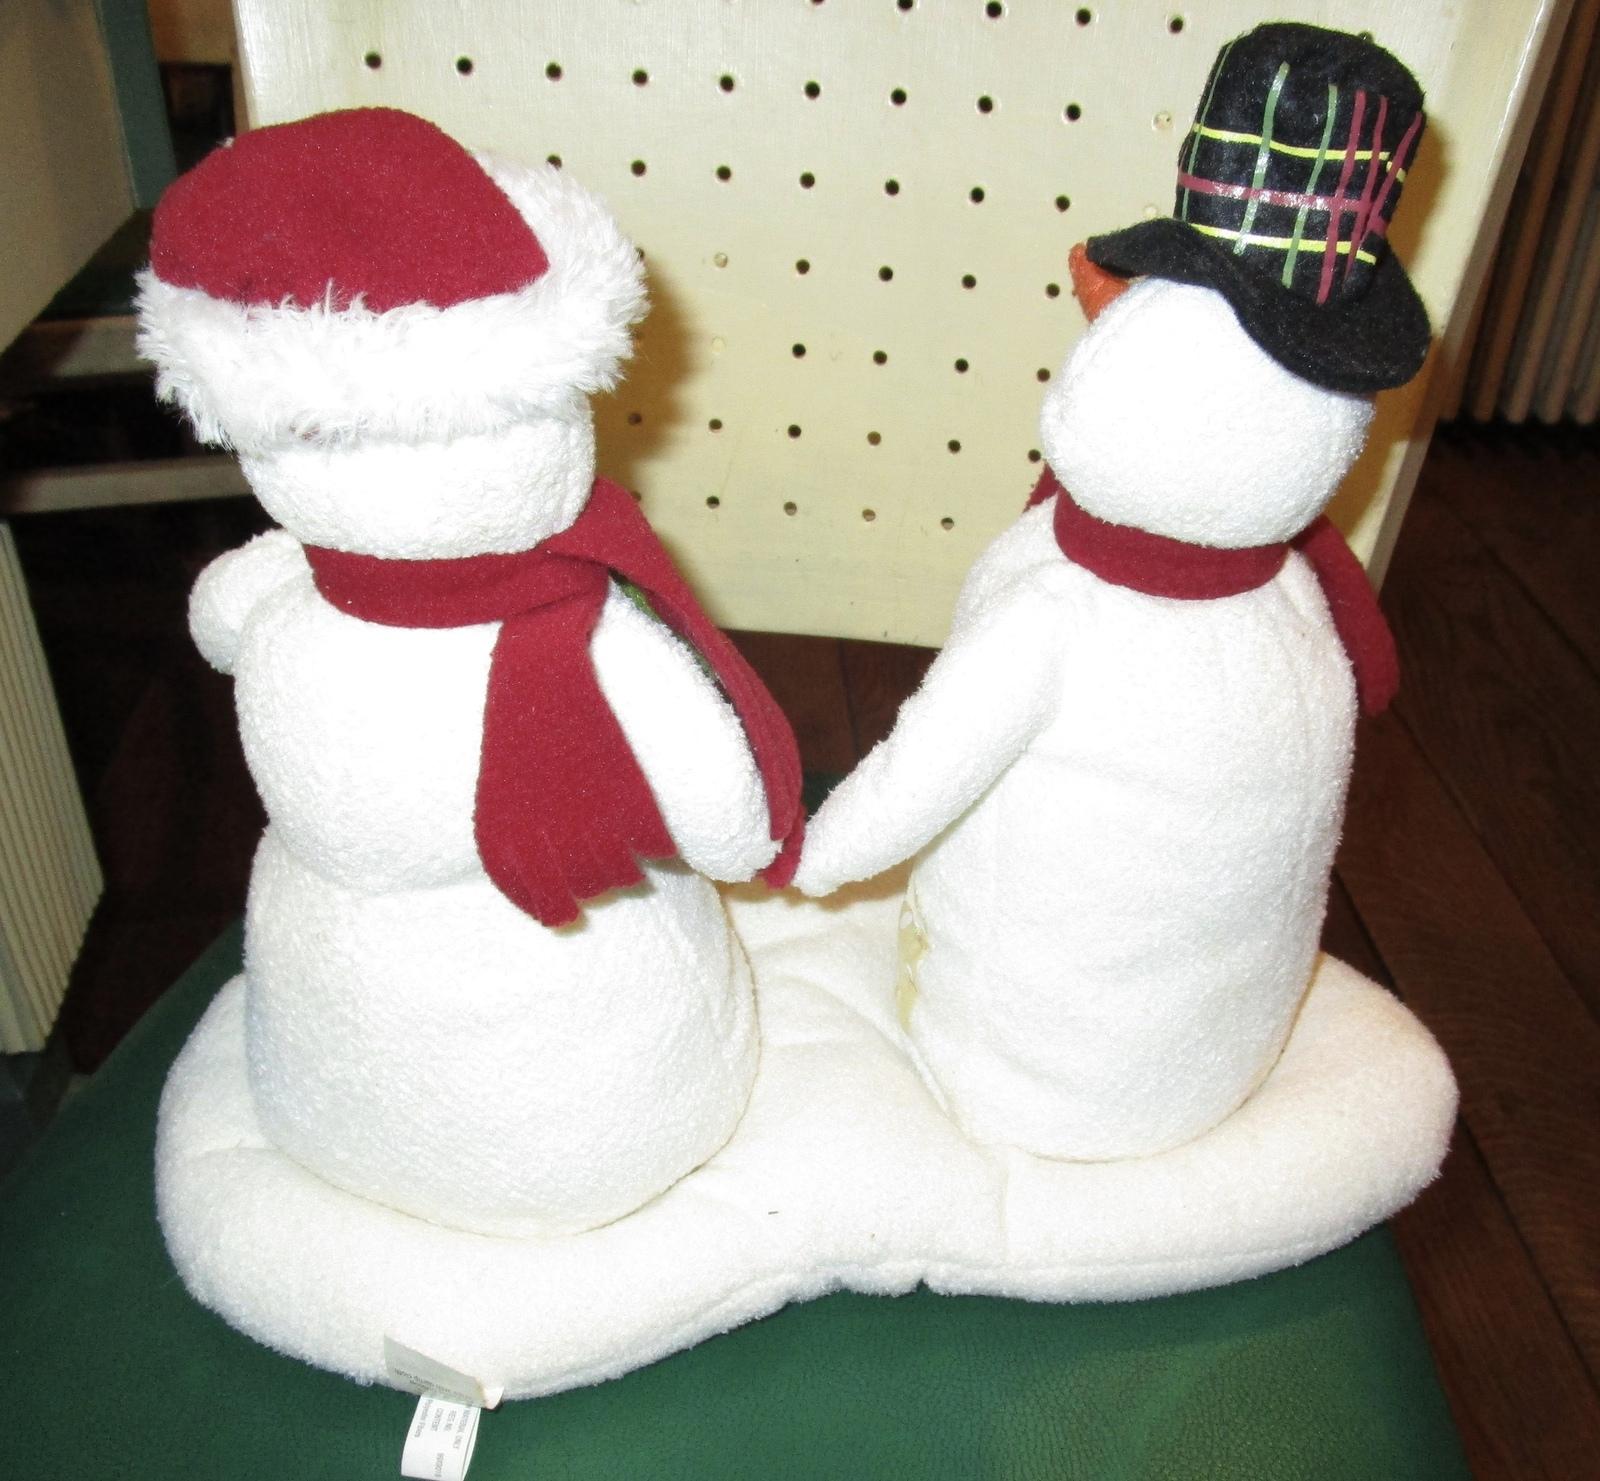 HALLMARK MR & MRS SNOWMAN JINGLE PALS 2003 MUSIC MOTION 1ST FRESH BATTERIES